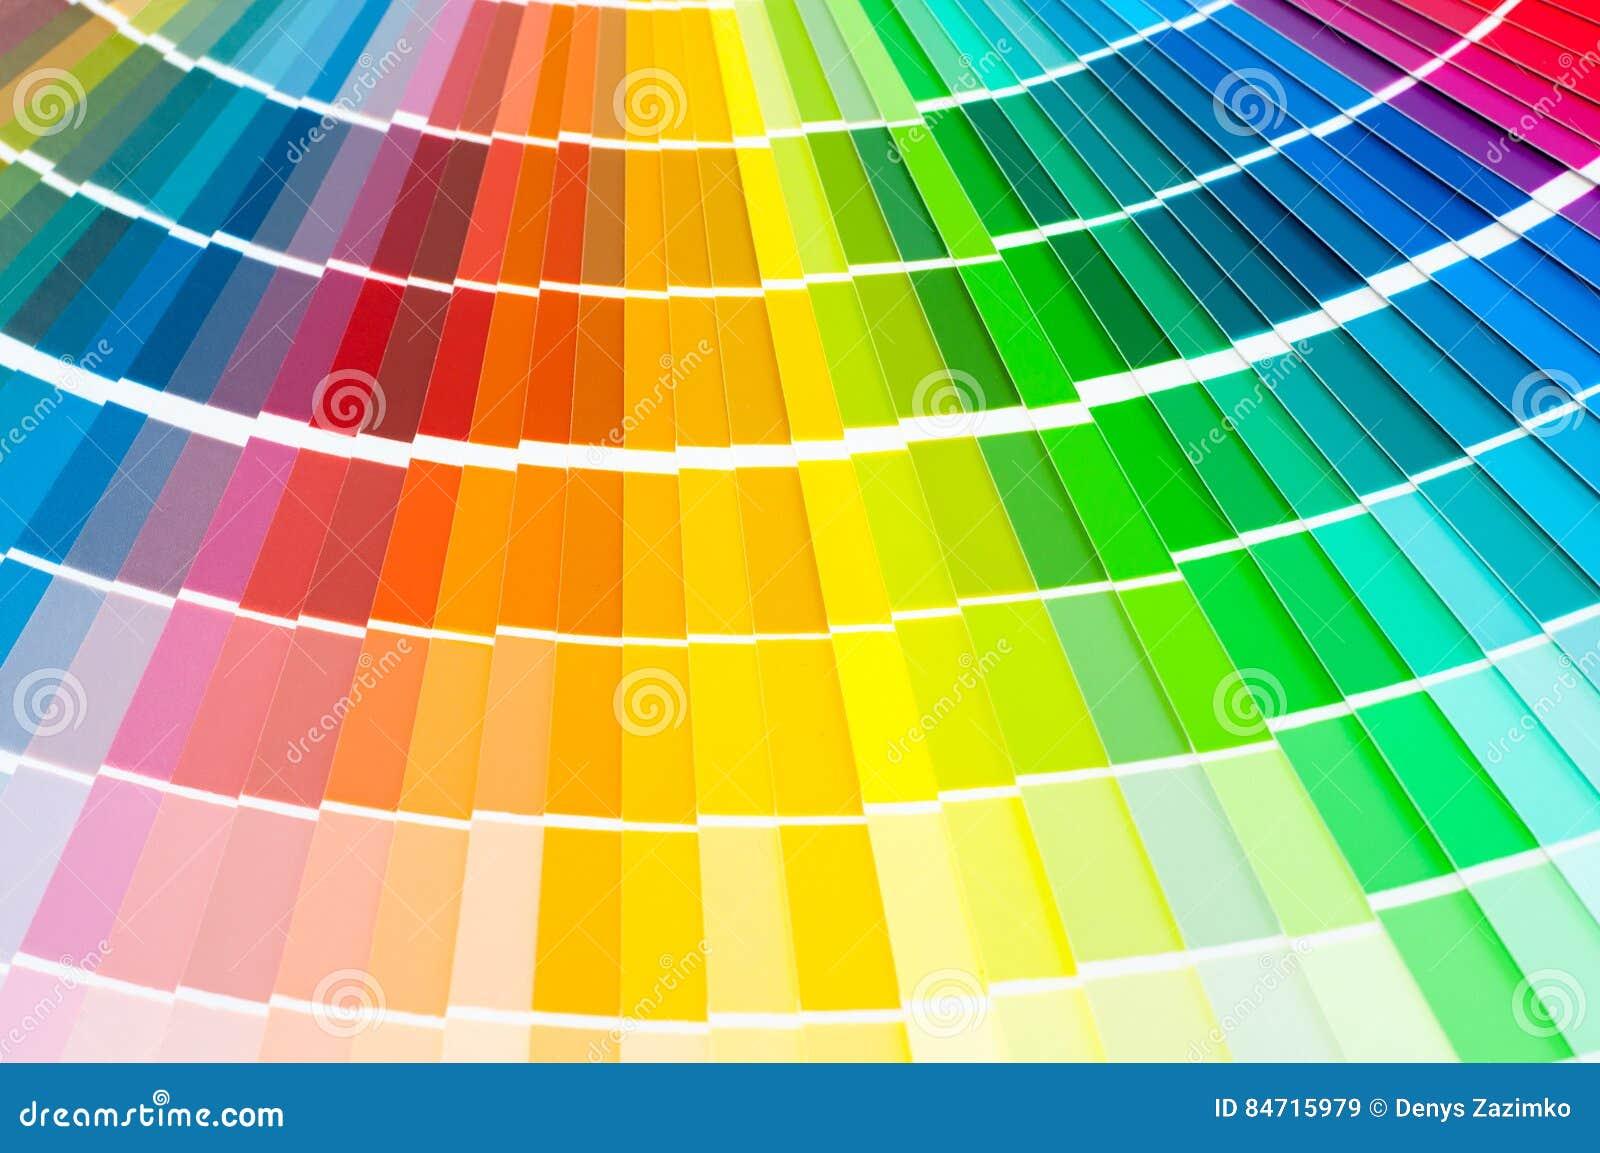 Paleta de colores pintura affordable paleta de colores - Paleta de colores pintura pared ...